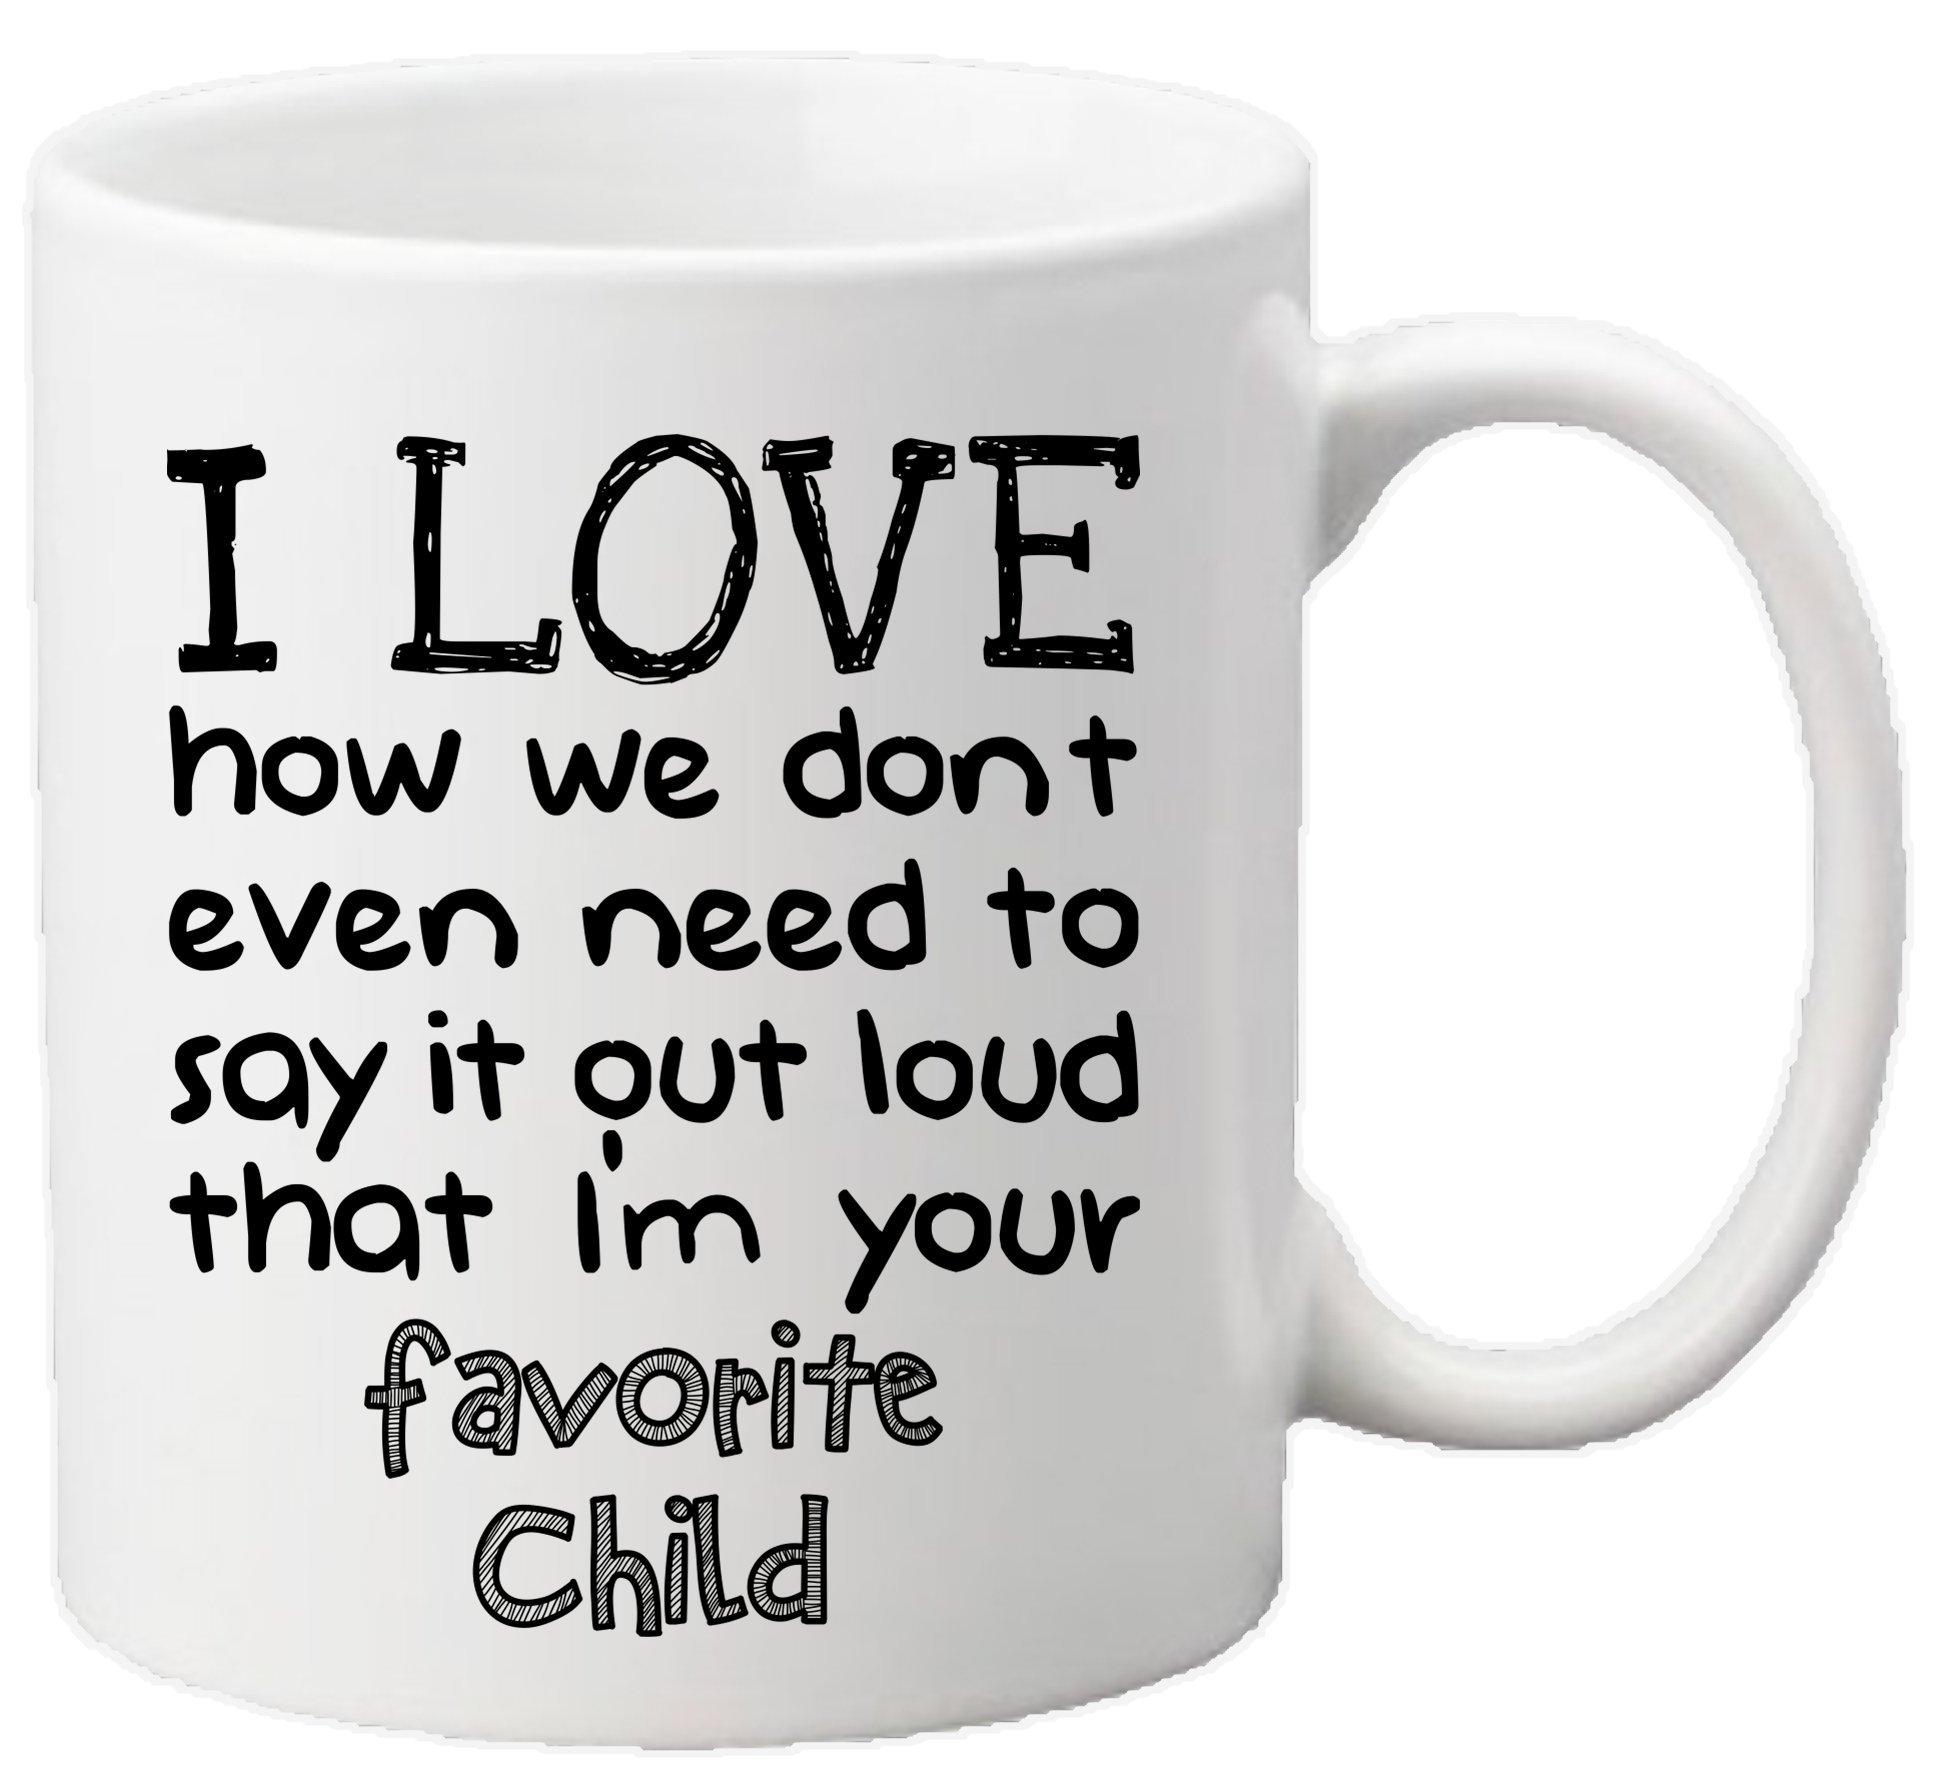 muggies favorite child 11oz funny ceramic mug unique gift for mom dad mothers